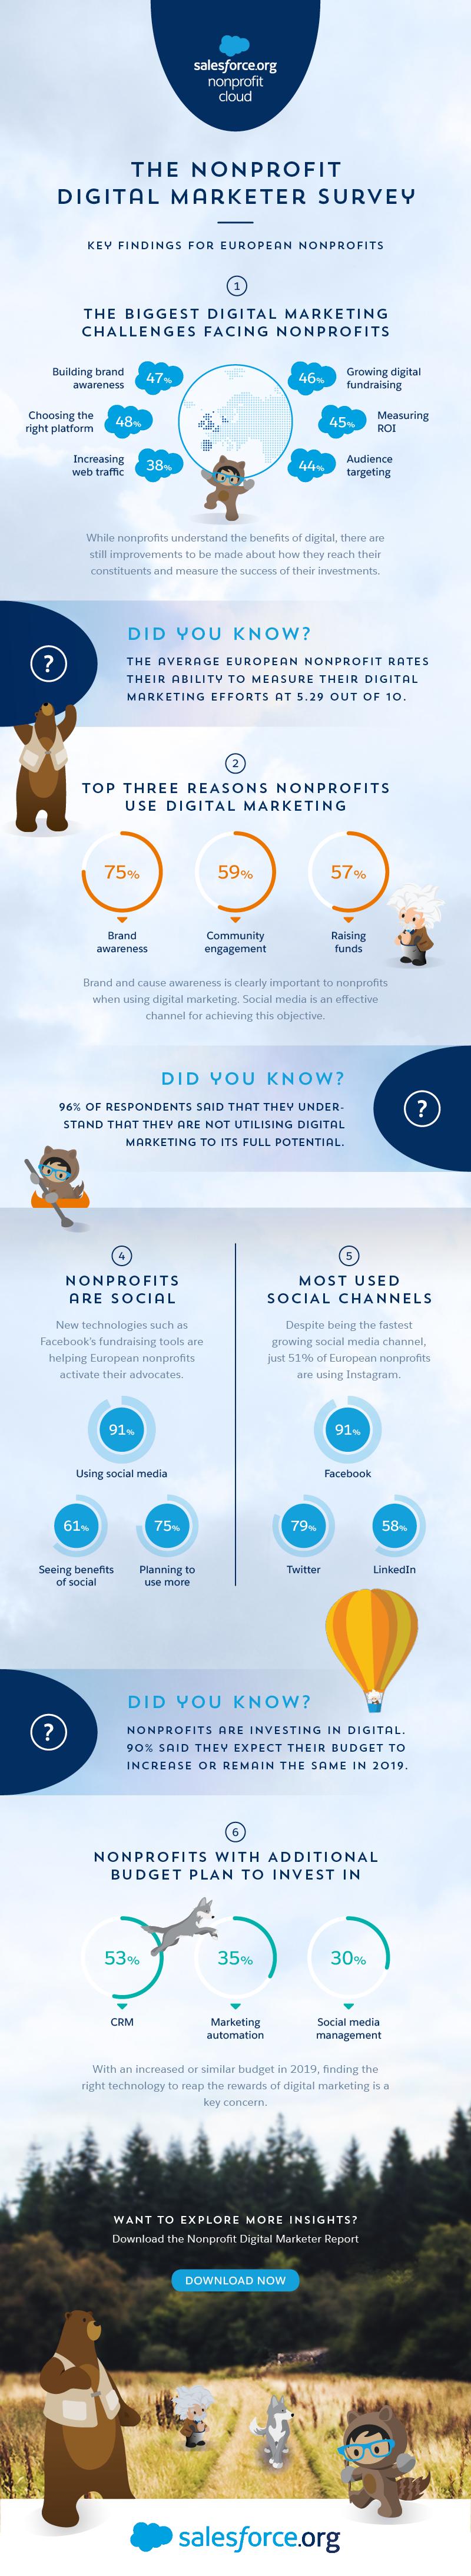 The Nonprofit Digital Marketer Survey Infographic